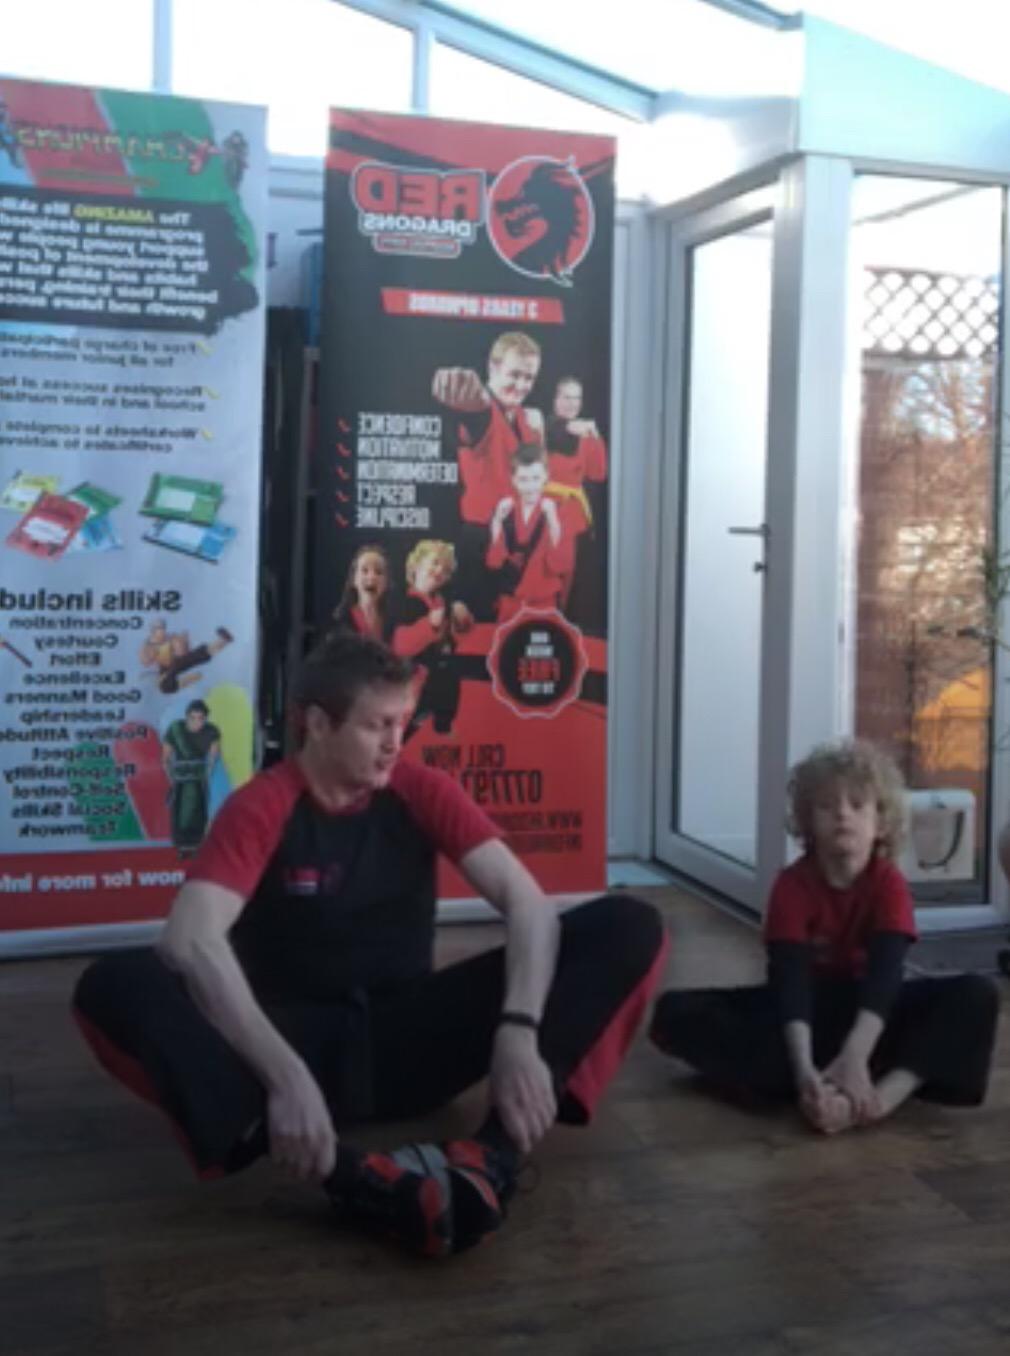 Red Dragons Martial Arts, Online classes, Bristol, Henleaze Horfield, Bishopston, MArtial arts for c